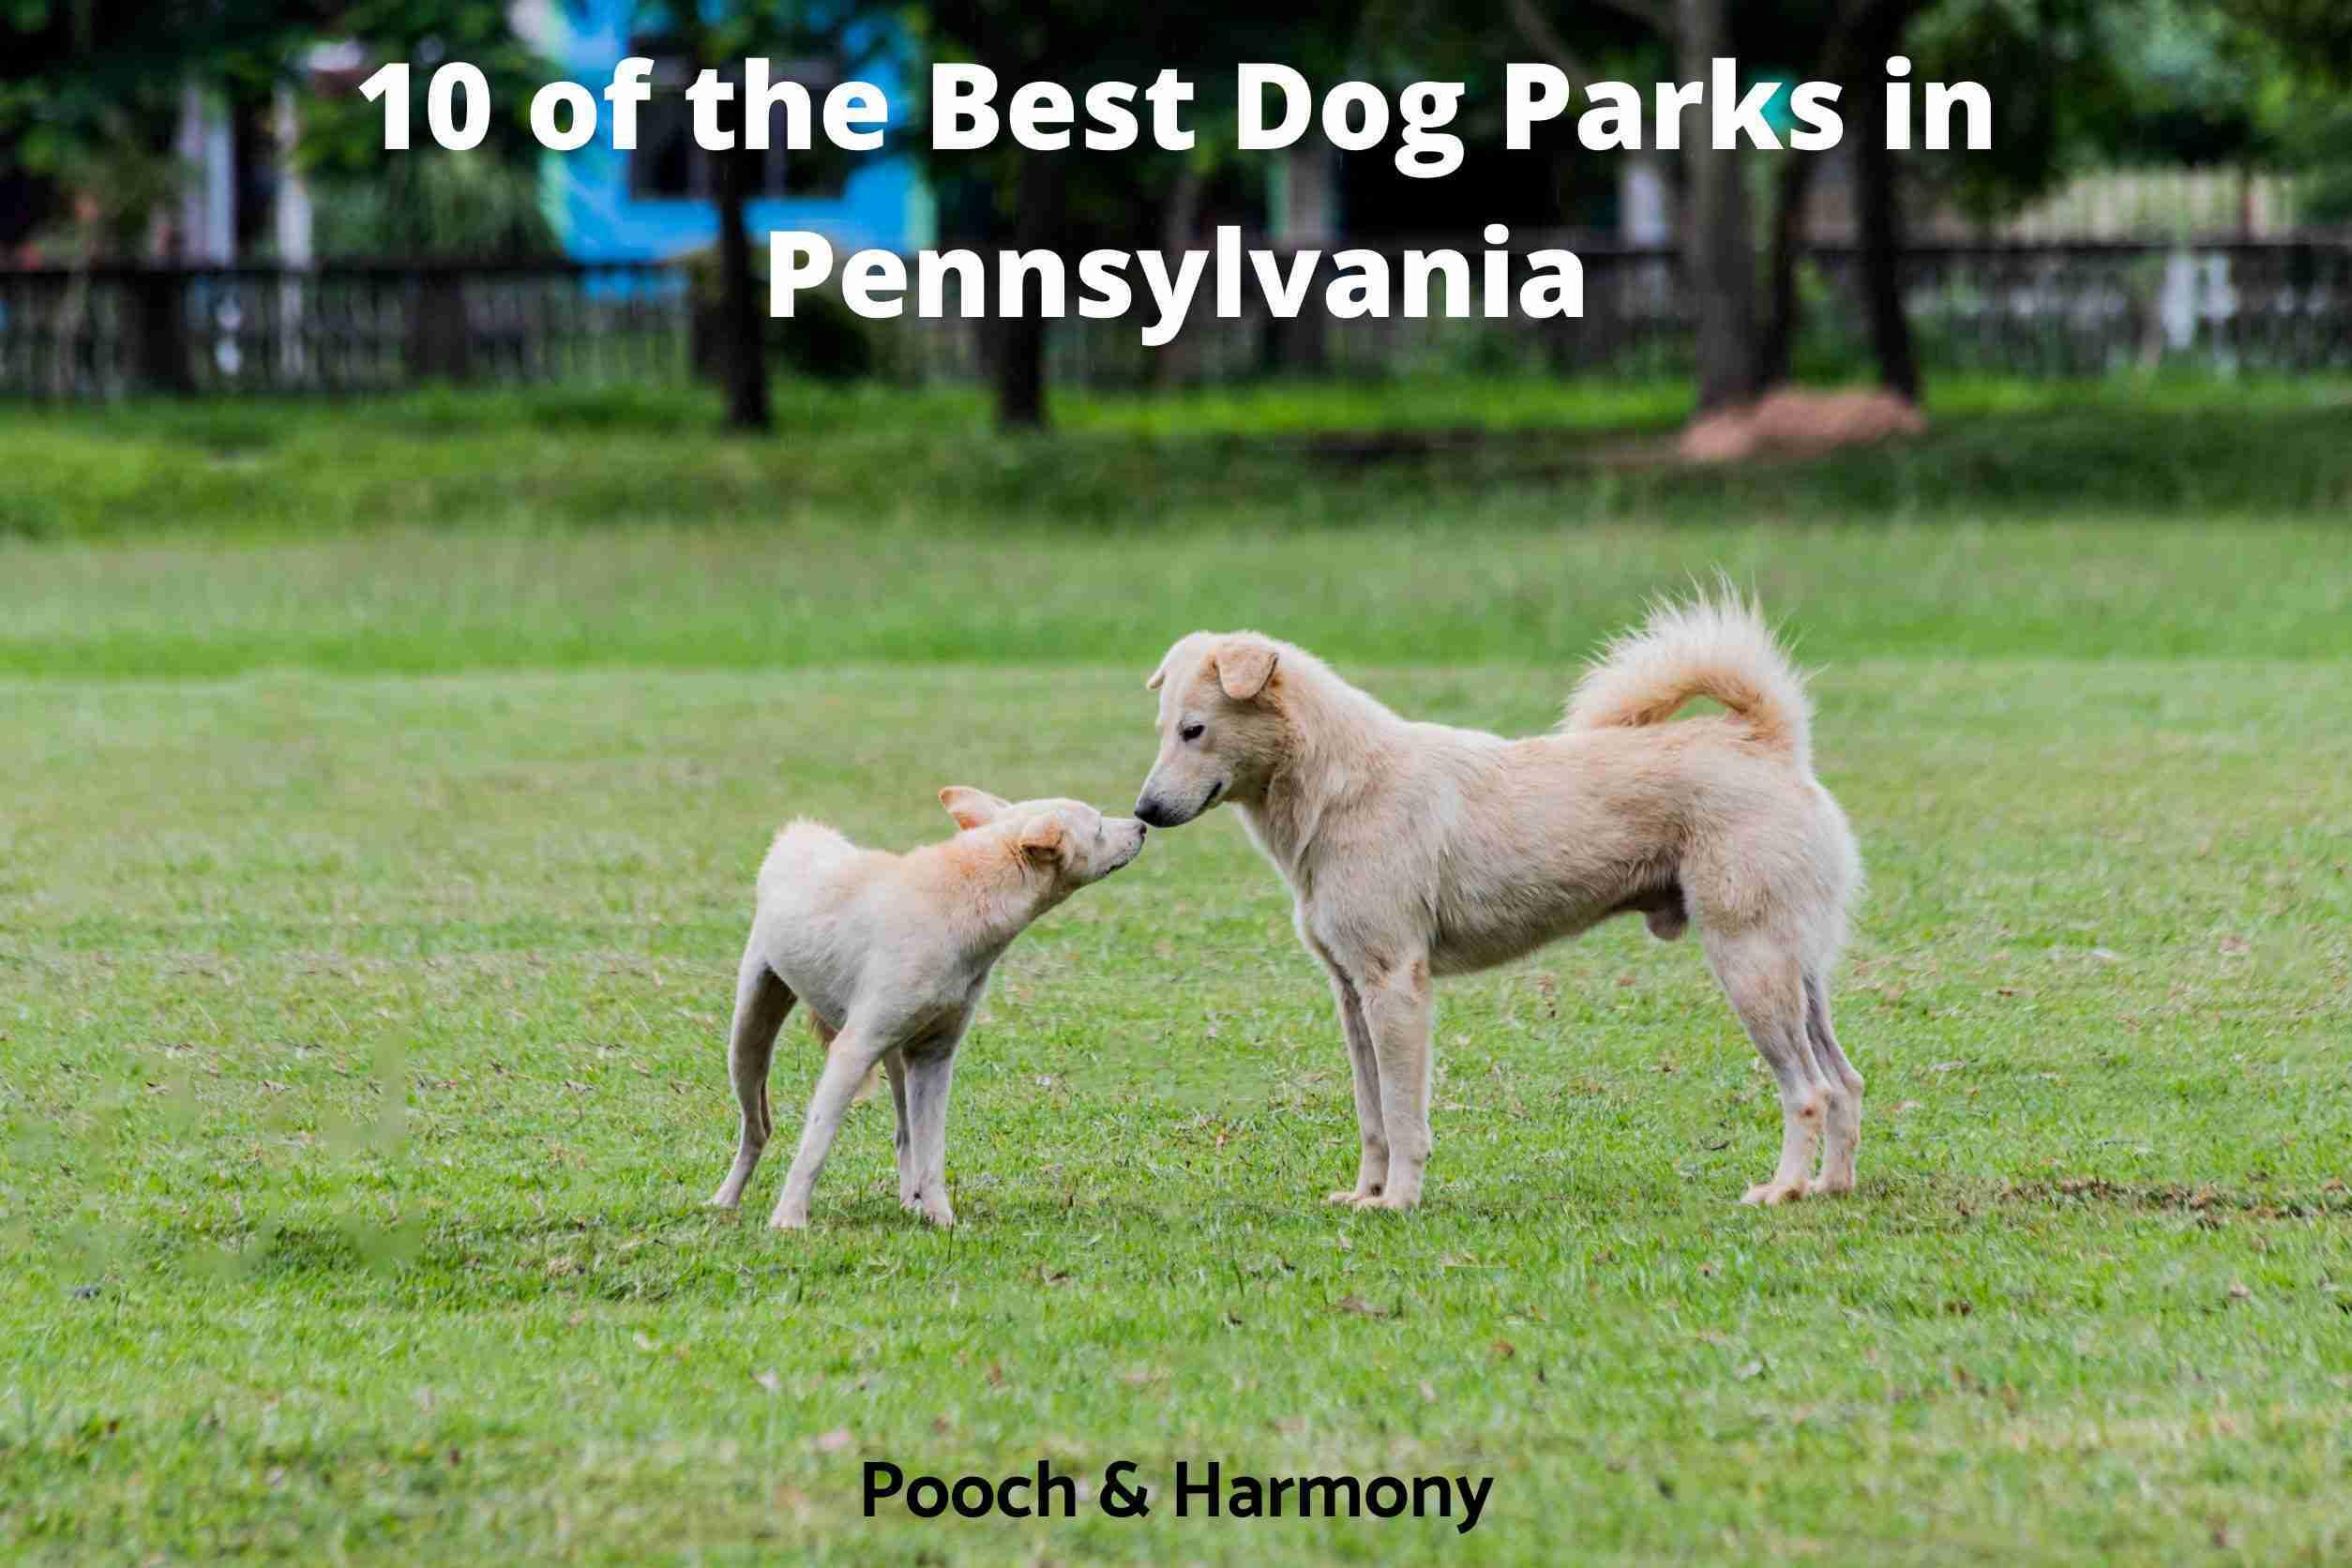 Best Dog Parks in Pennsylvania